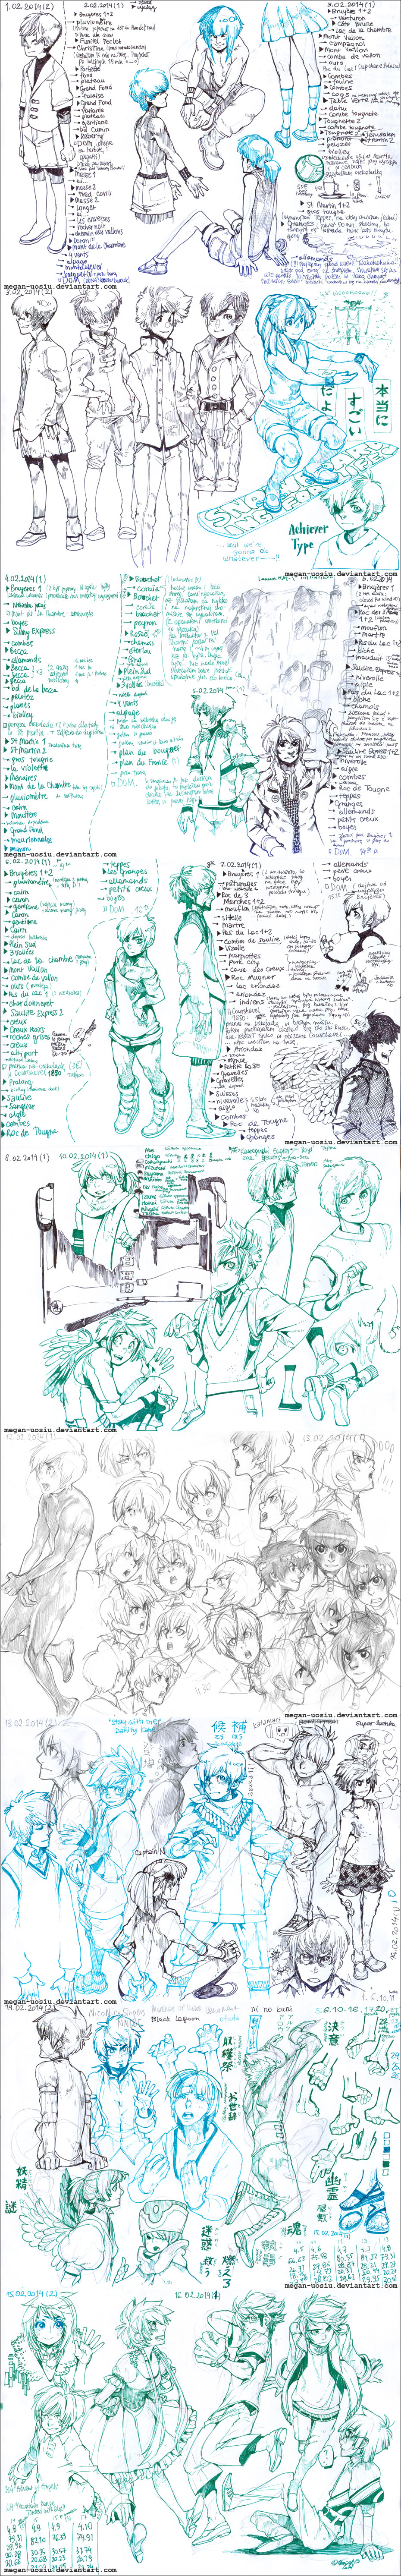 Sketches_055 by Megan-Uosiu